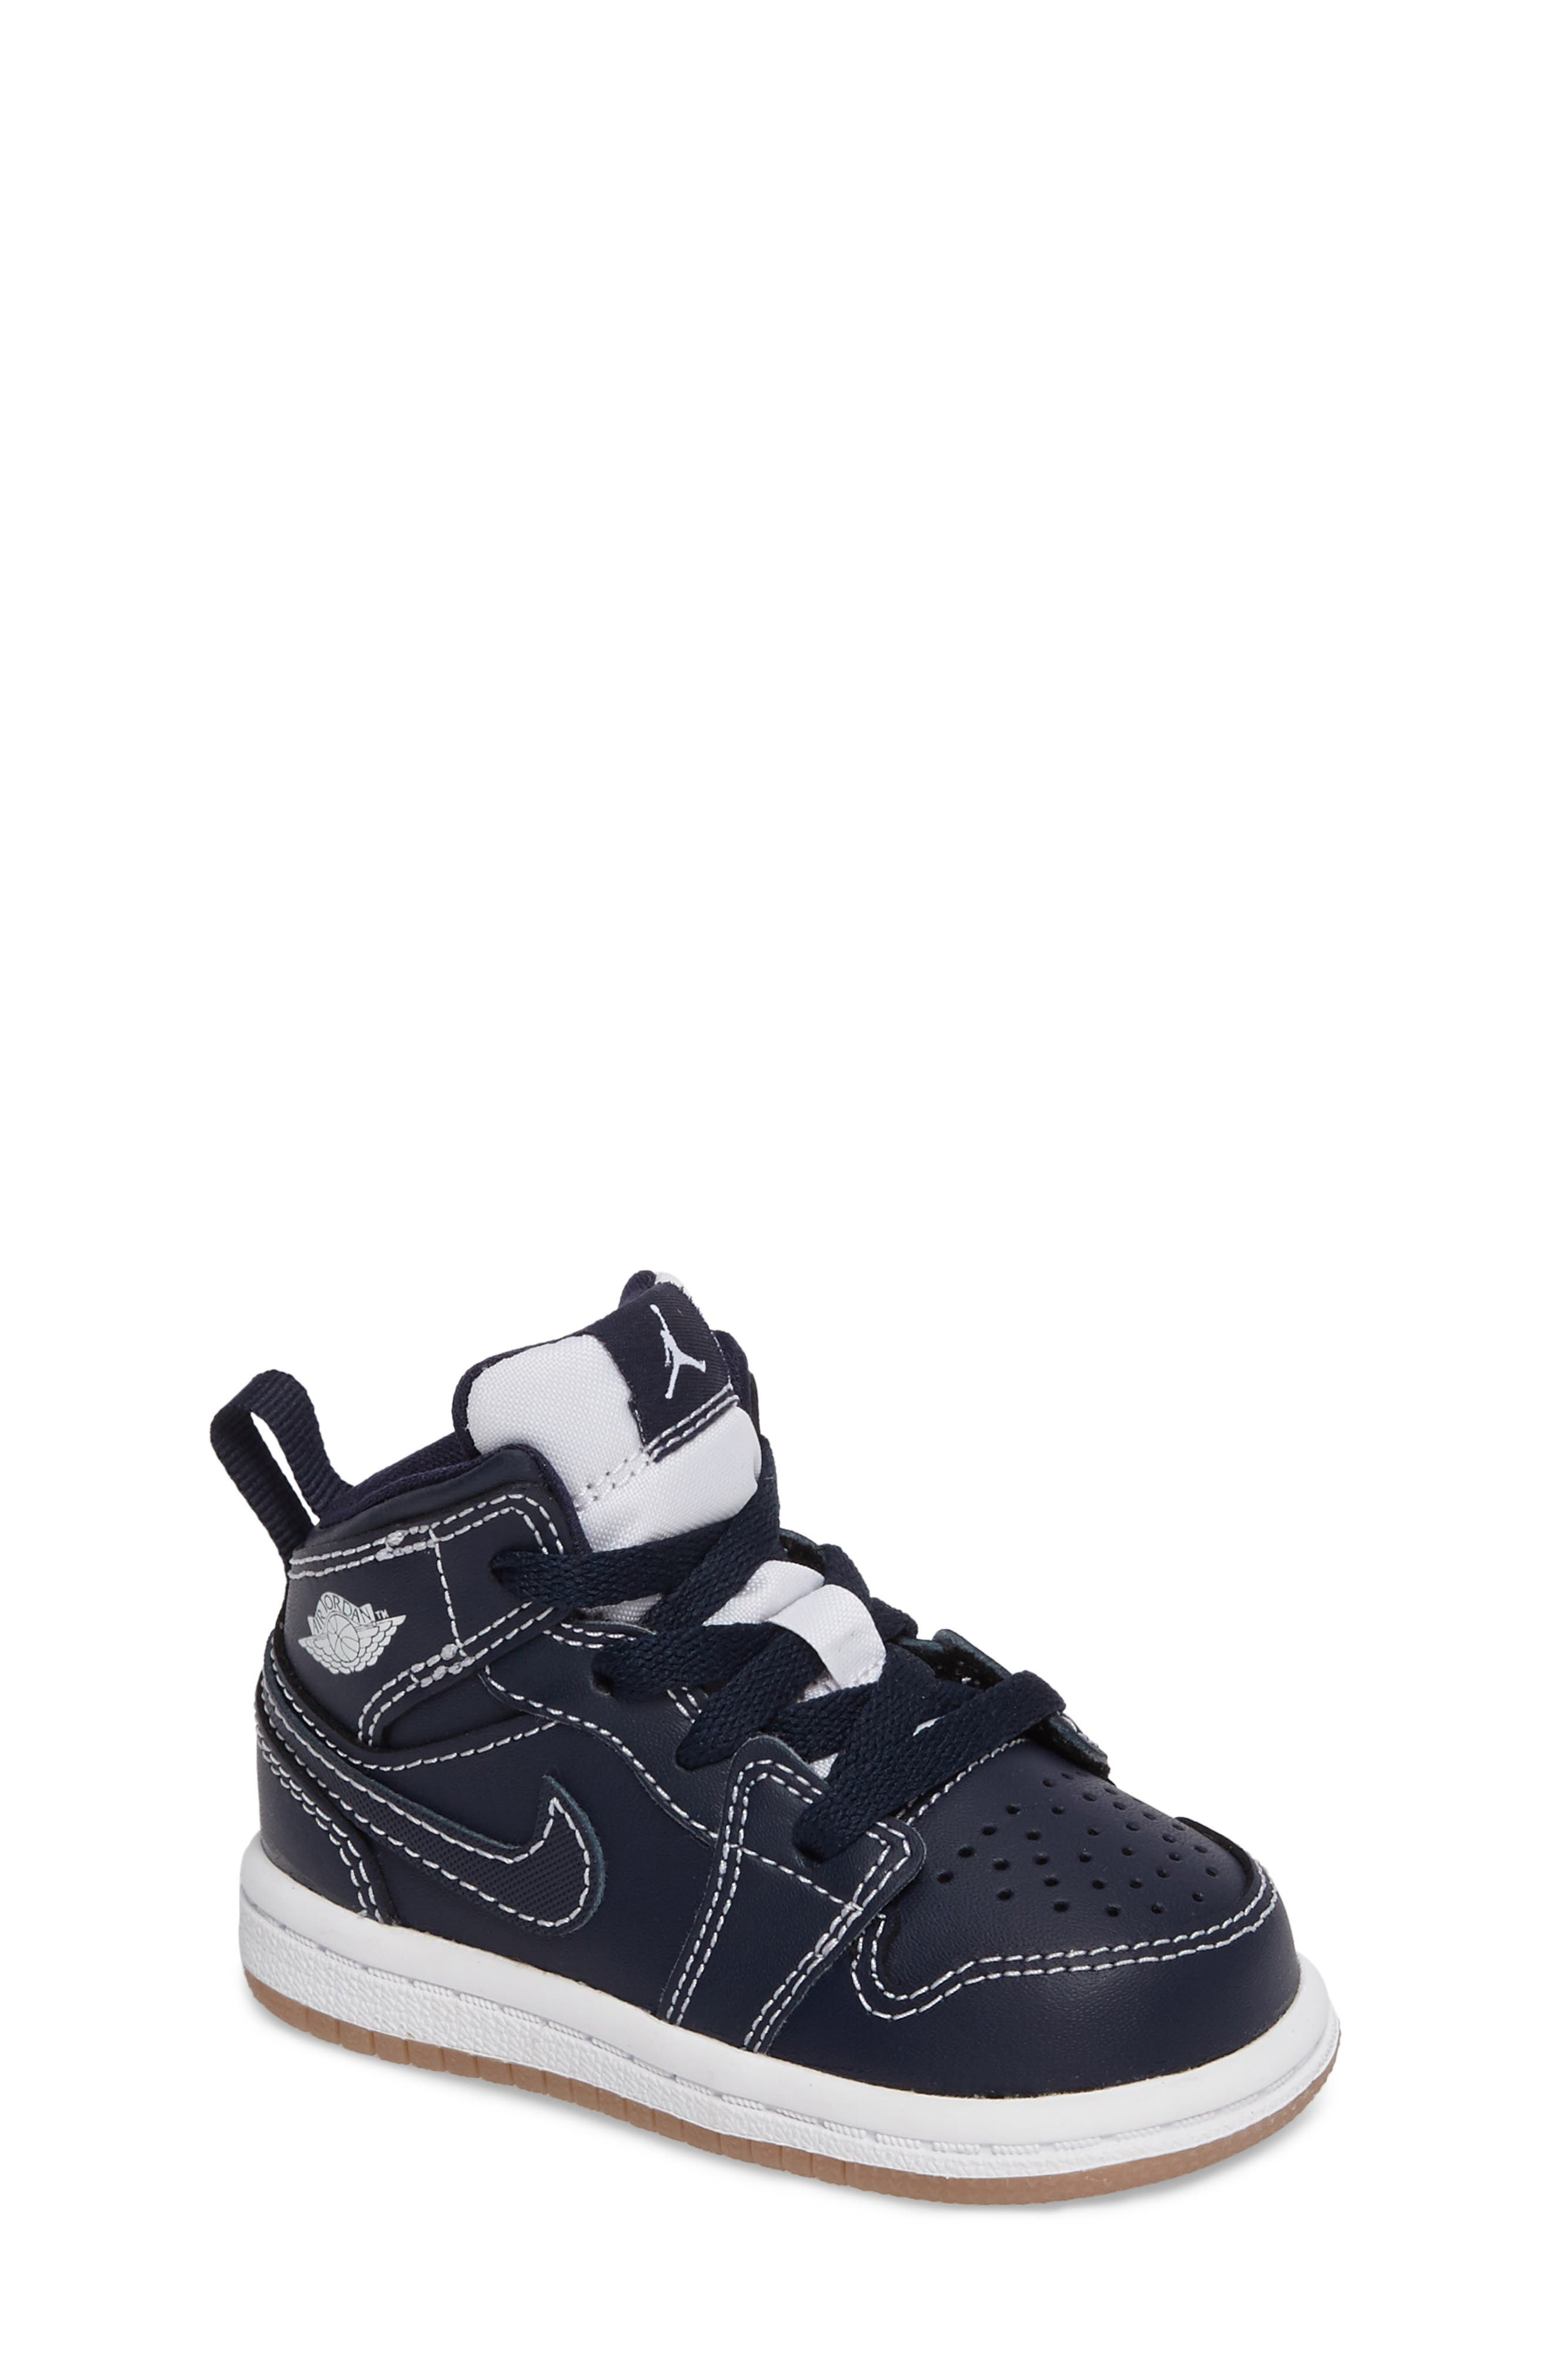 Alternate Image 1 Selected - Nike 'Air Jordan 1' Mid Sneaker (Baby, Walker & Toddler)